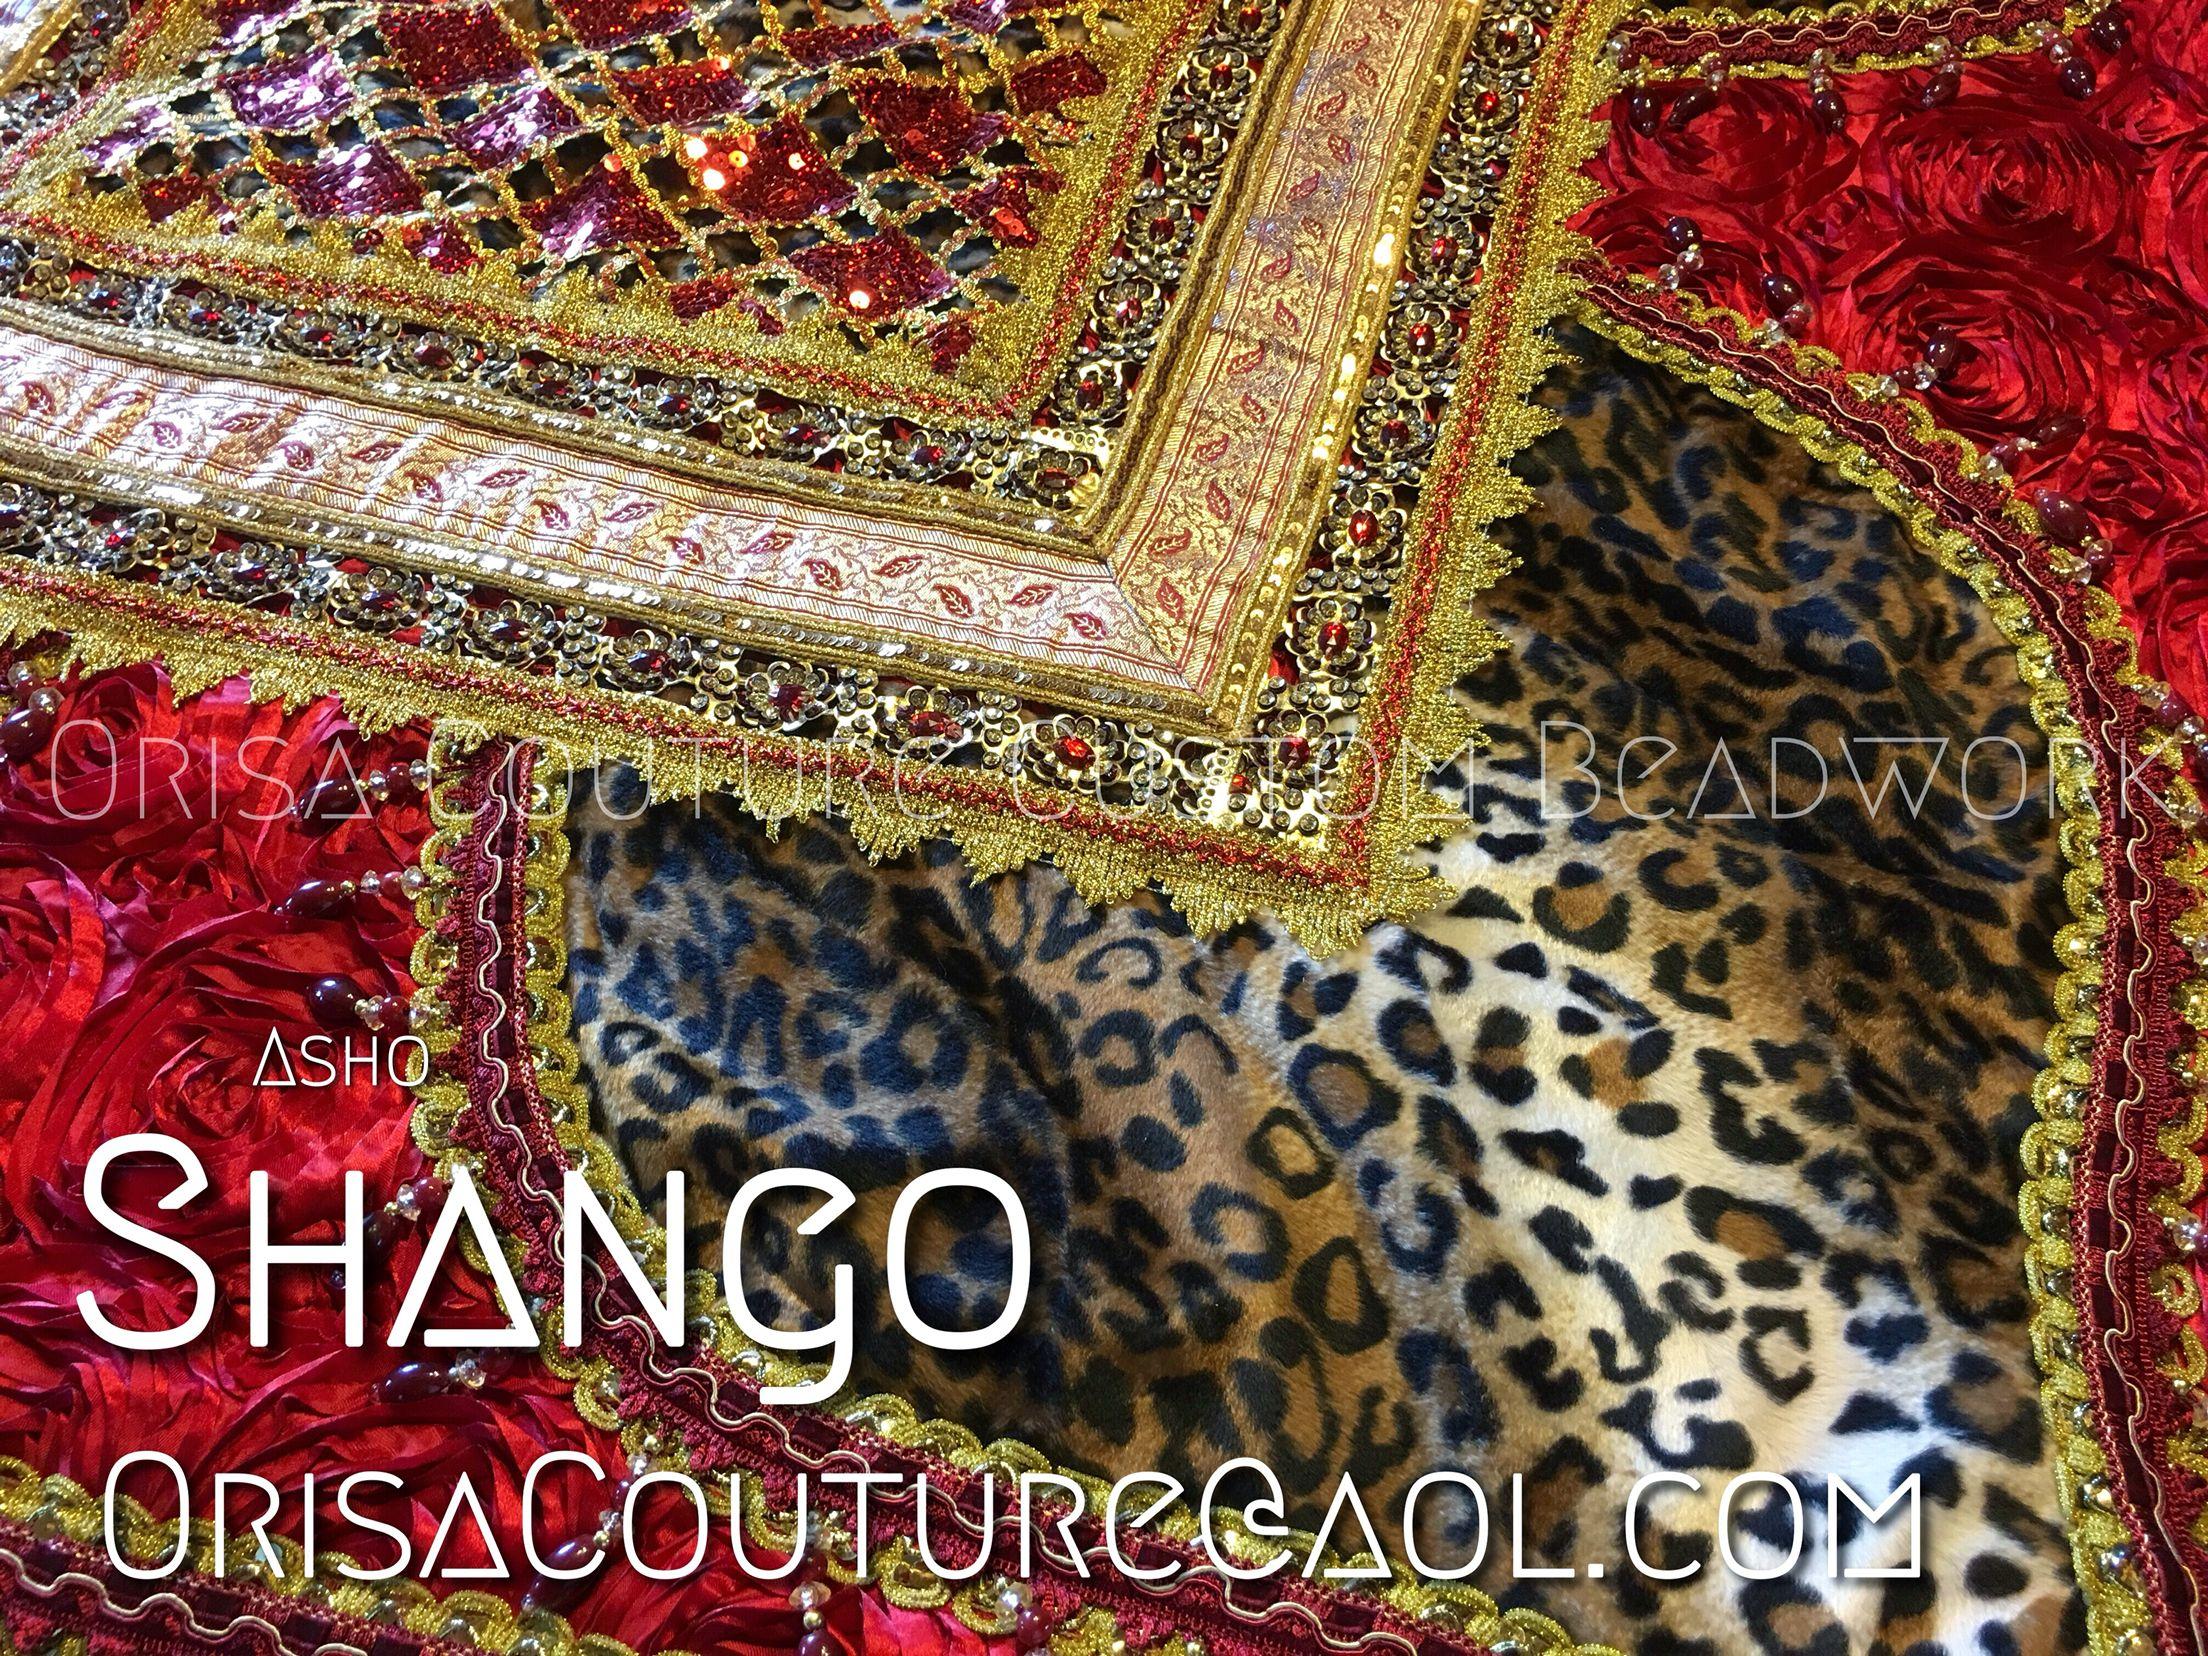 Asho Shango For inquires, please send an e-mail to OrisaCouture@aol.com #asho #aso #shango #chango #jakuta #olufina #obakoso #orisa #orisha #lukumi #santeria #yoruba #orisacouture